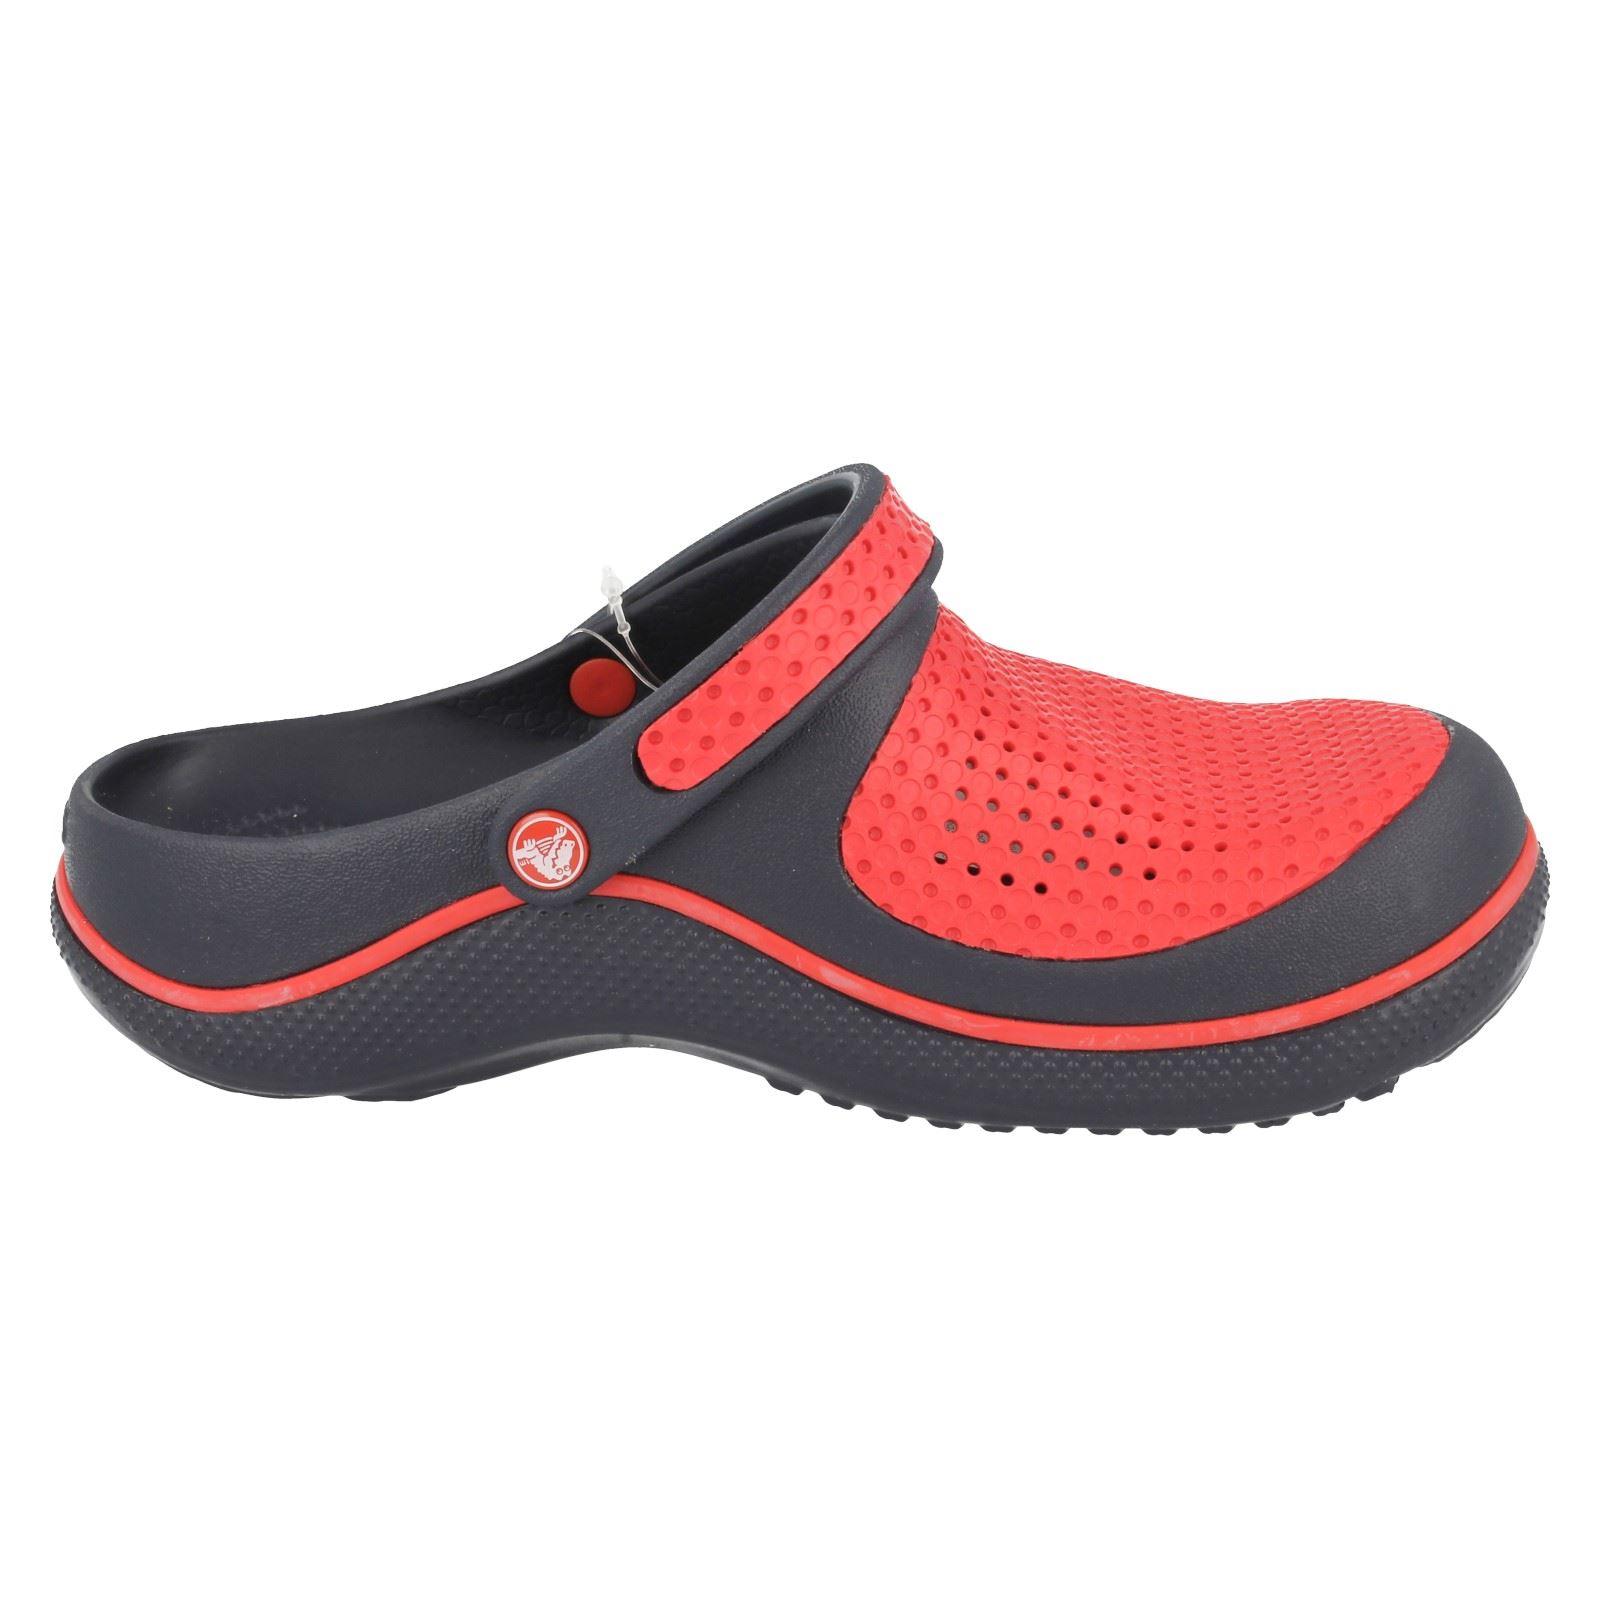 Childrens Crocs Casual Slip On Synthetic Summer Sandals Crosmesh Clog Kids